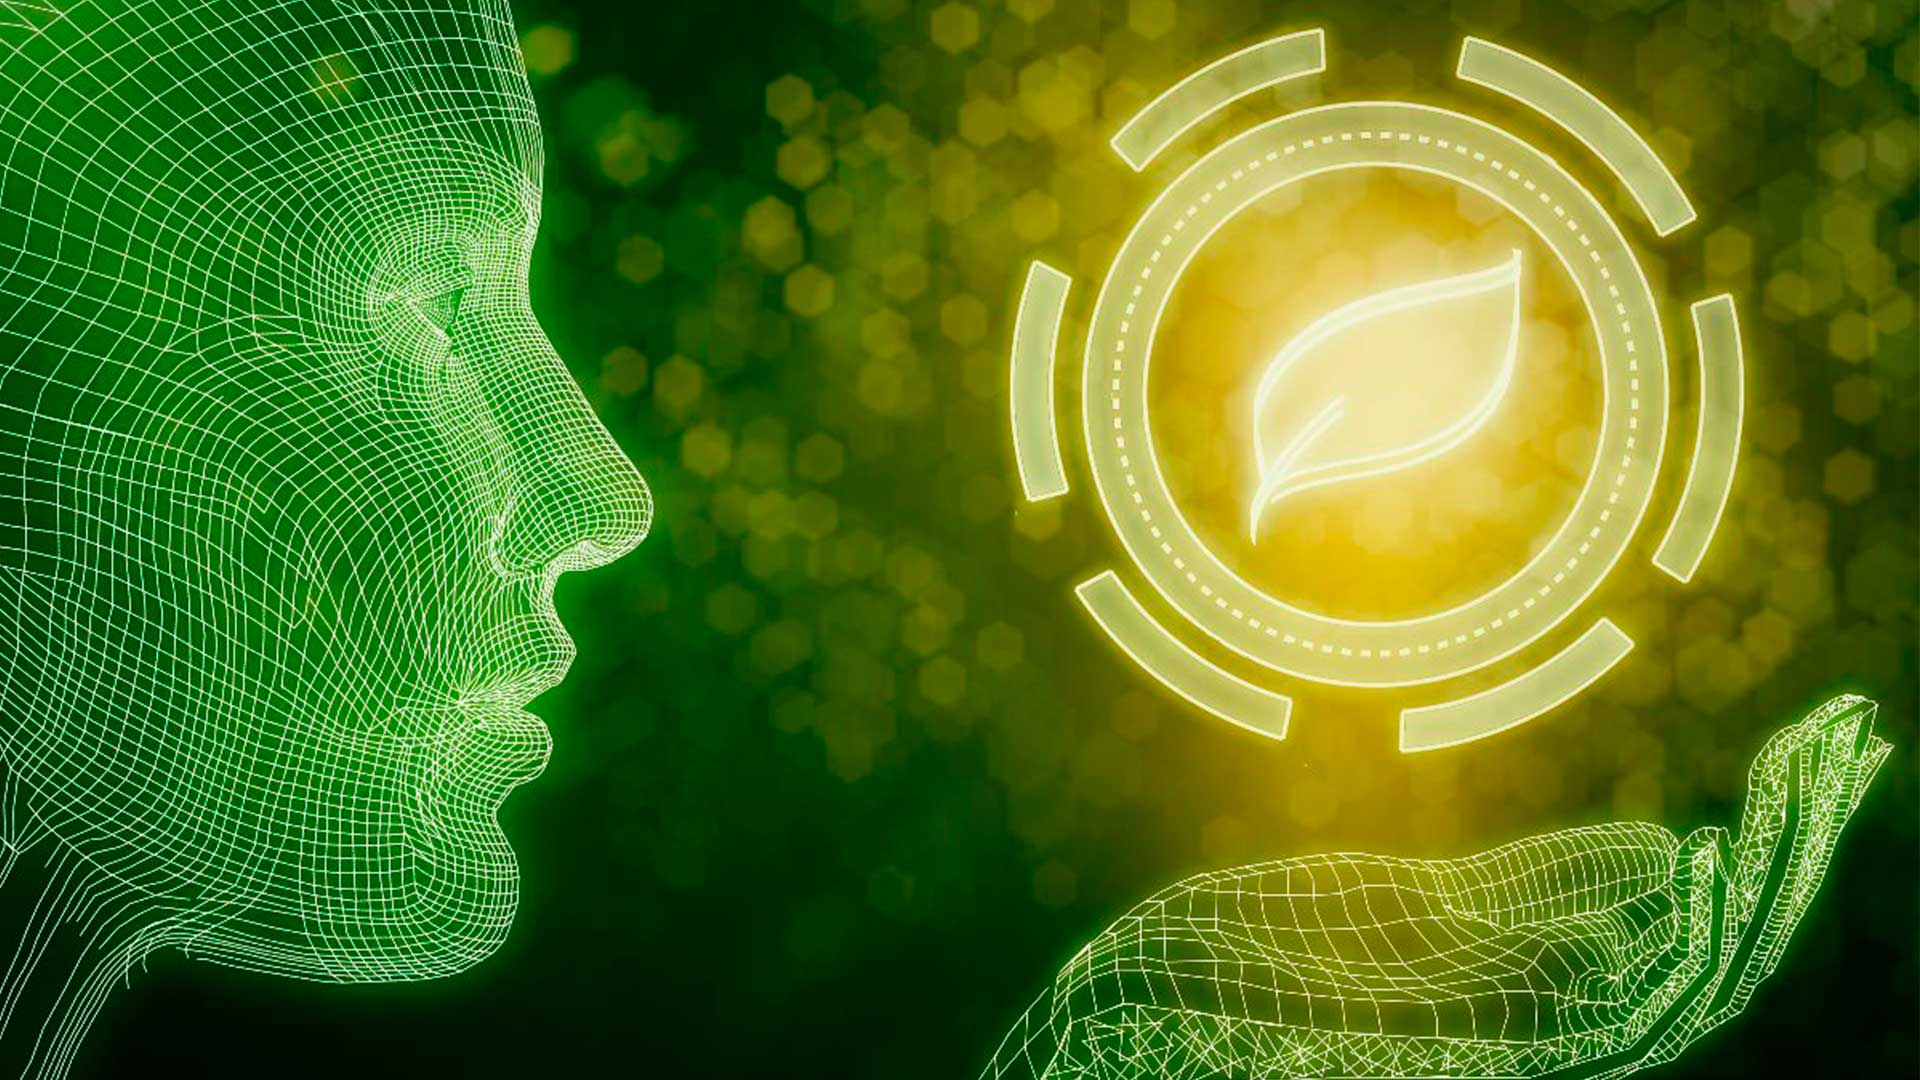 Digitalization Circular Economy